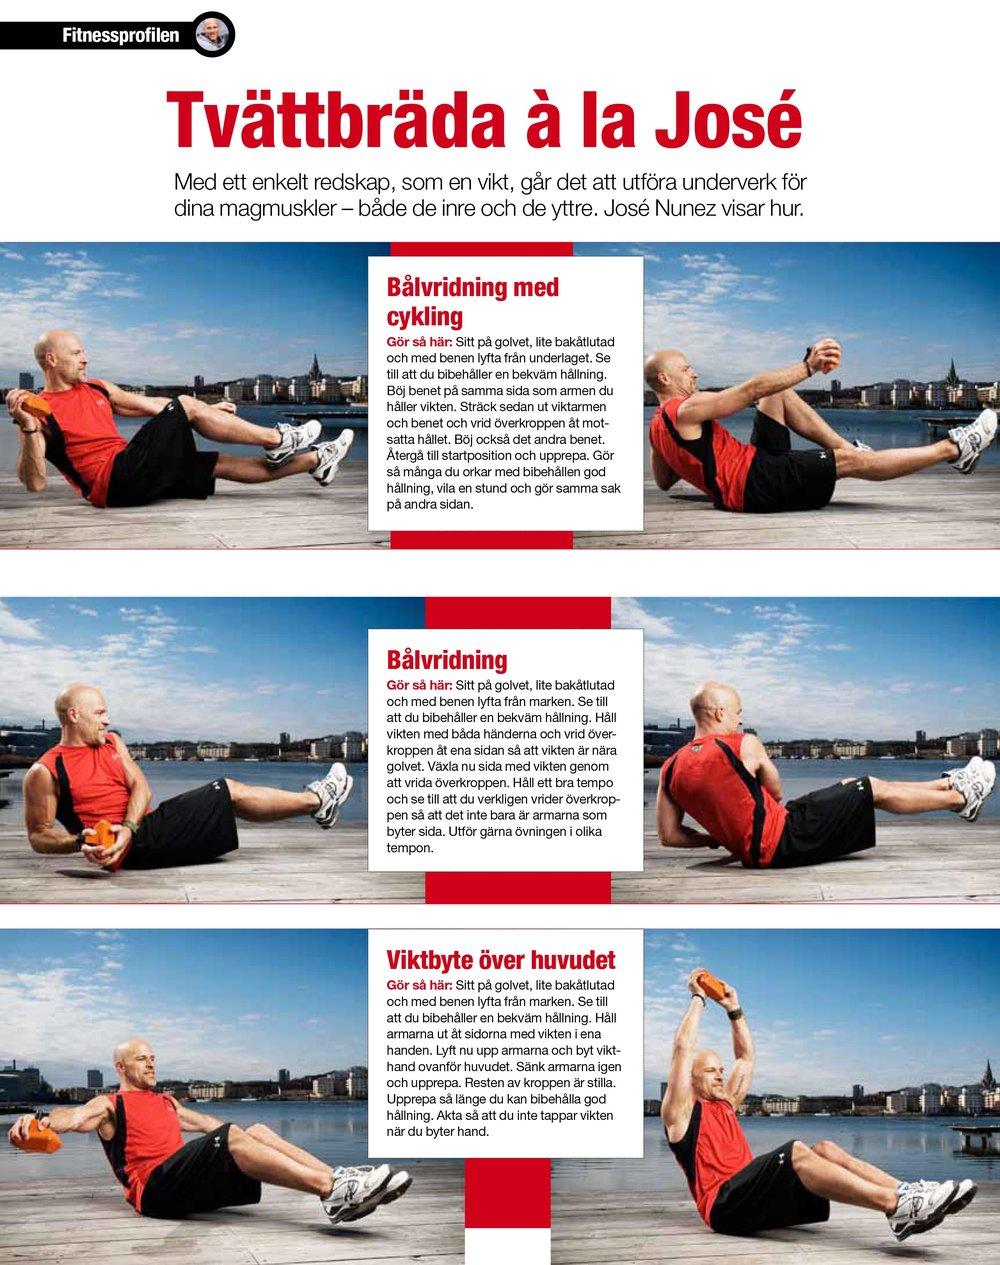 fitnessprofilen(1)-5.jpg